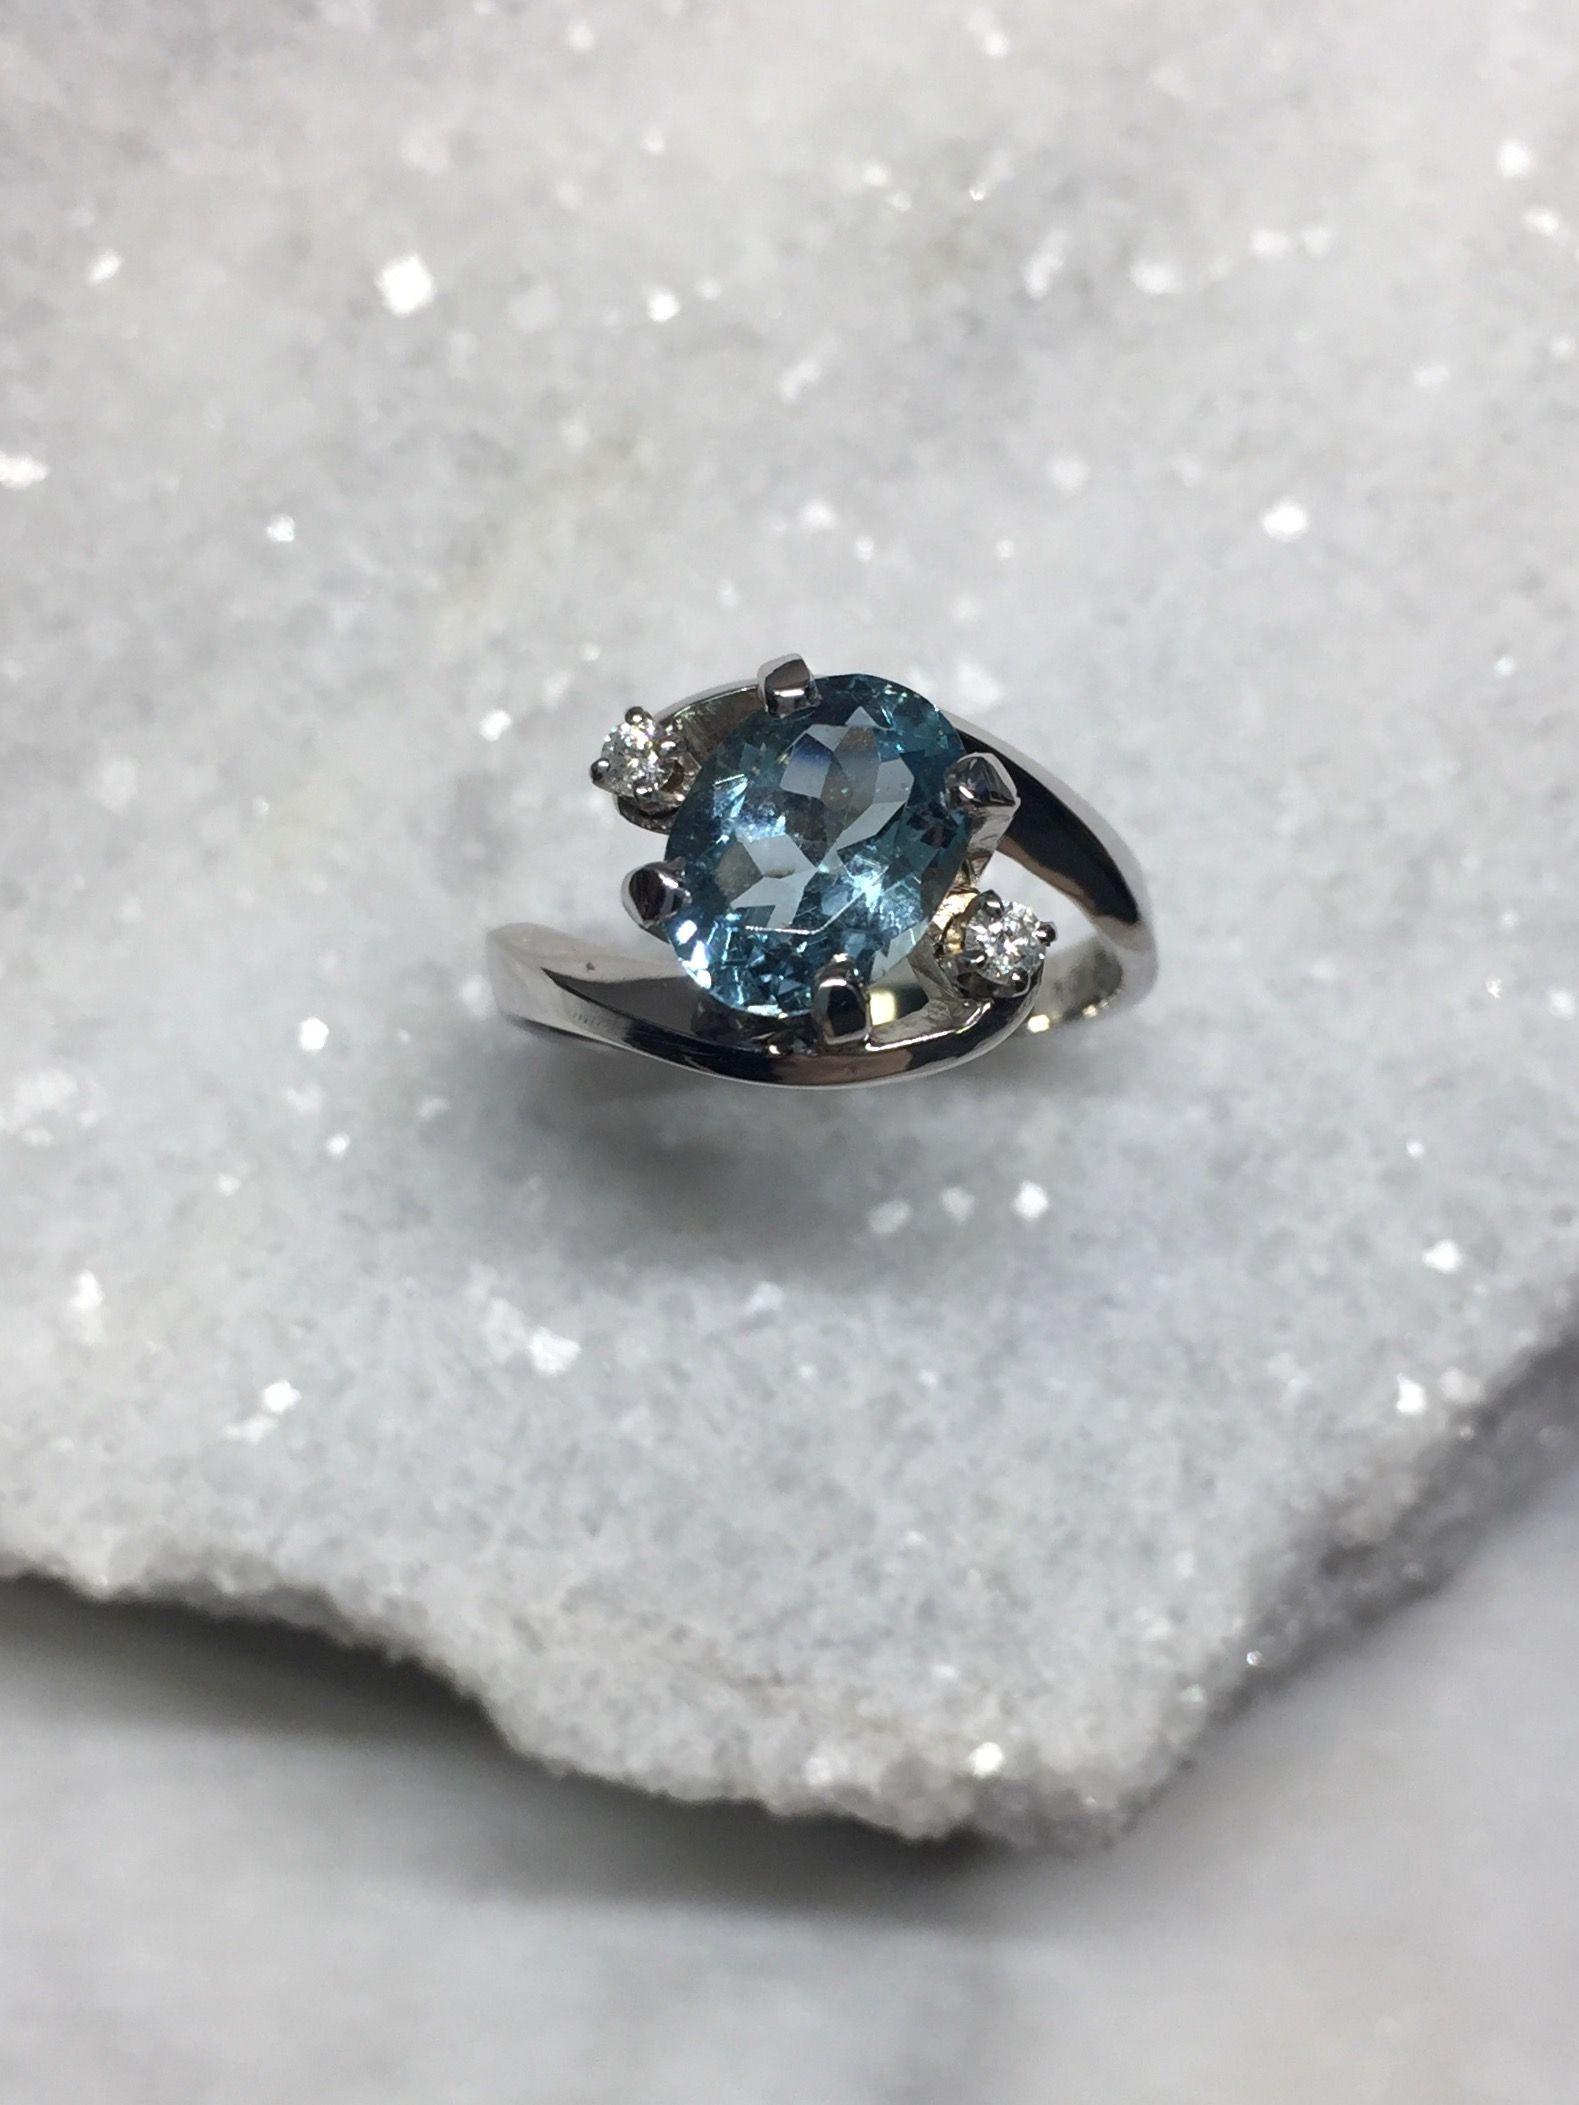 10k White Gold Aquamarine And Diamond Ring Rings White Gold Diamond